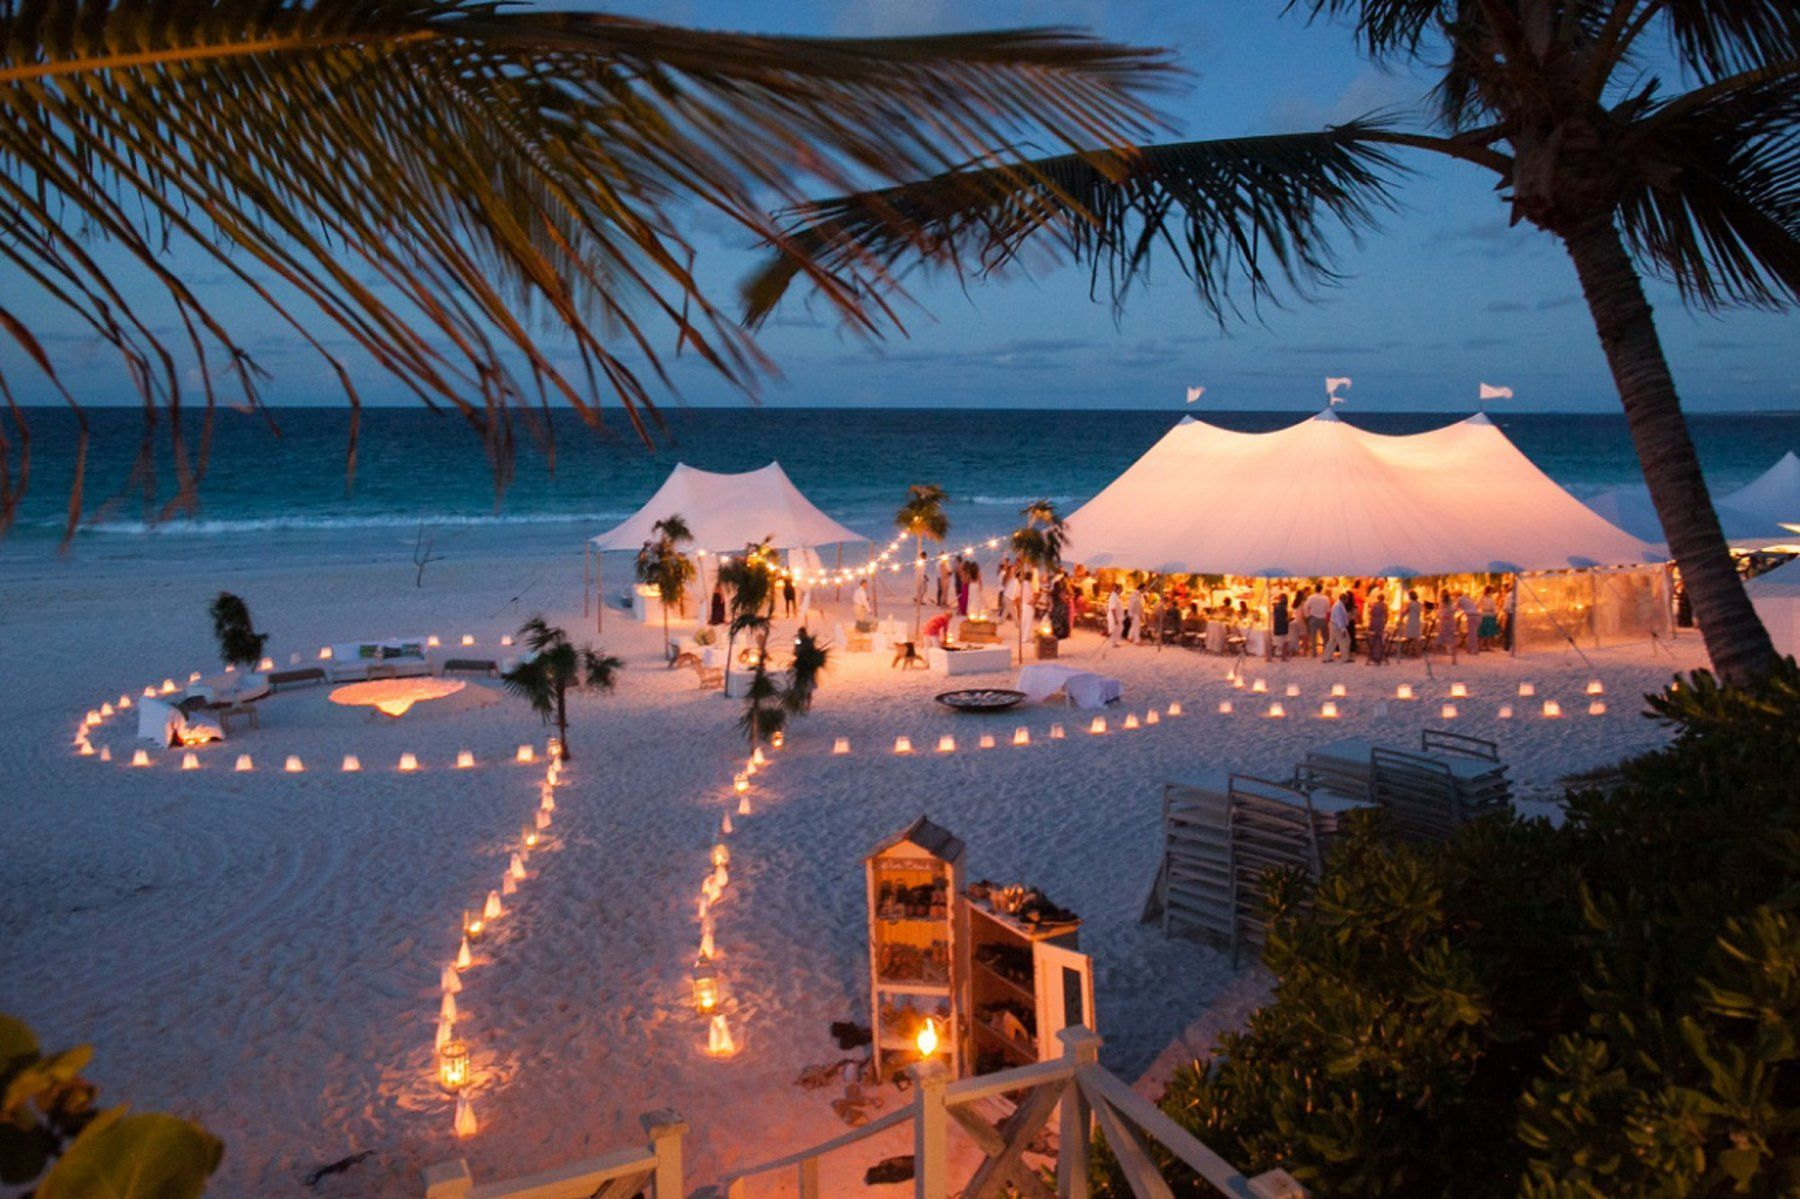 Beach wedding decoration ideas  Beautiful beach wedding DestinationWeddingIdeas  Destination